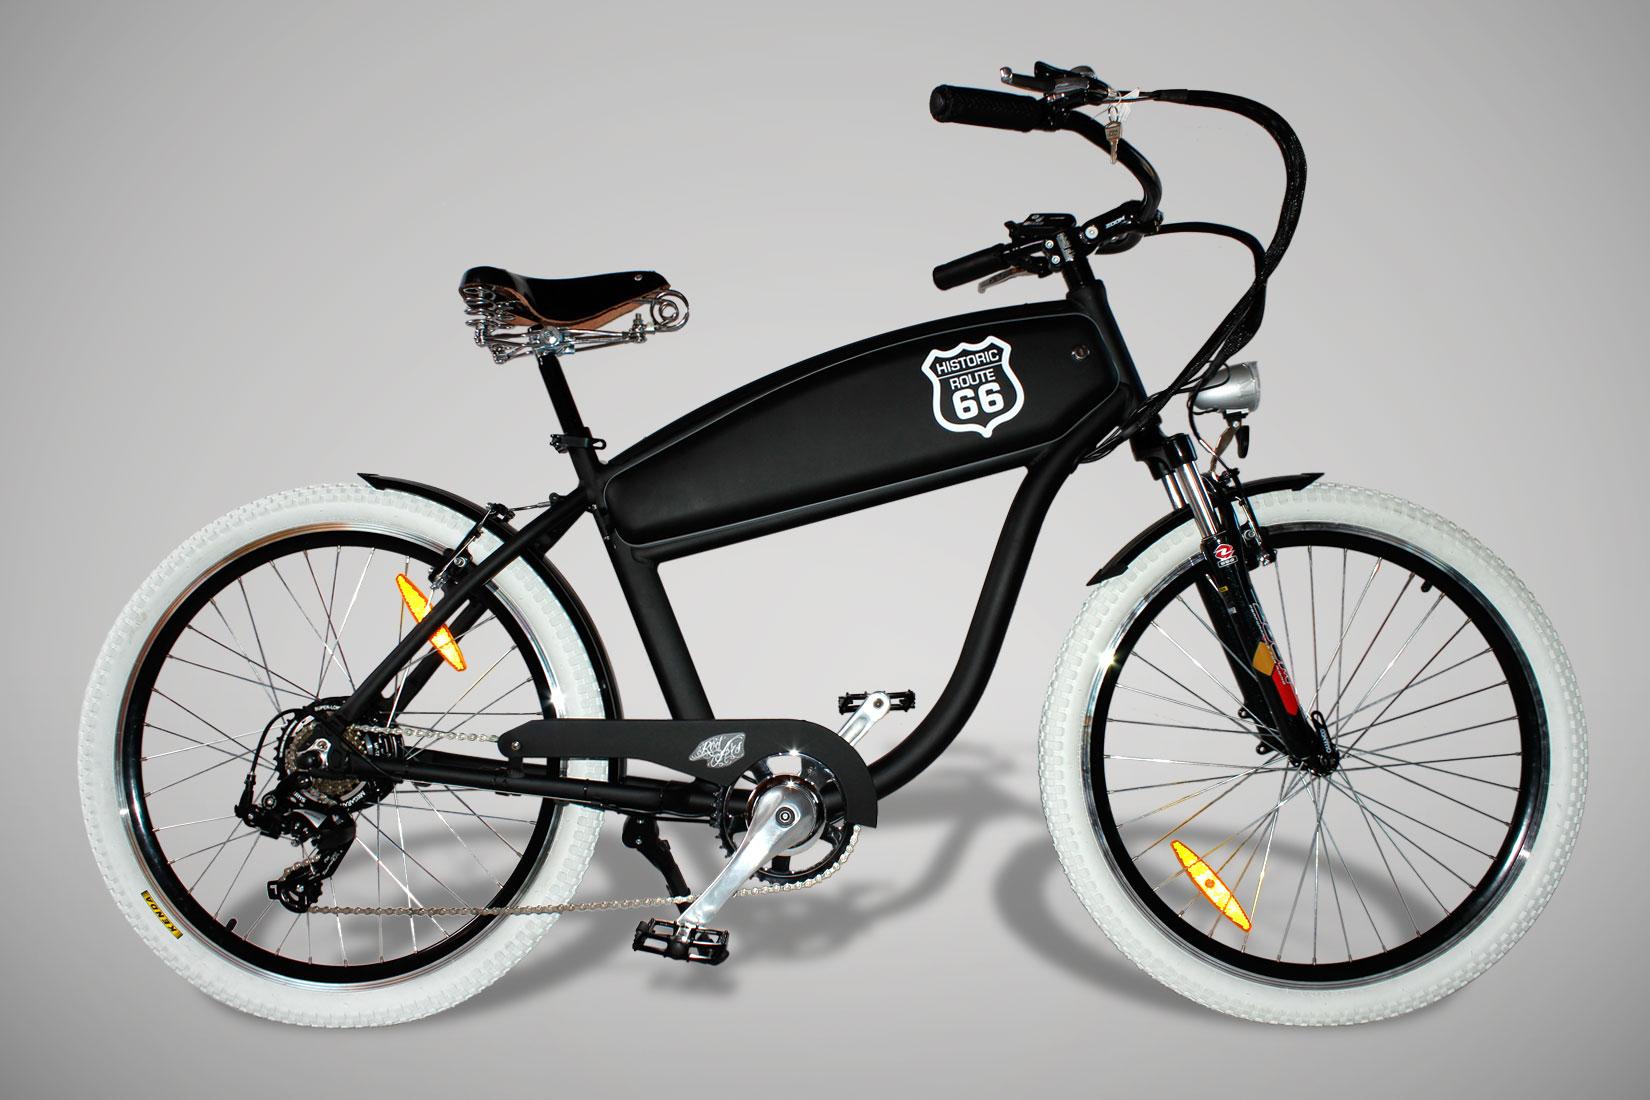 Convertir una bici normal en electrica